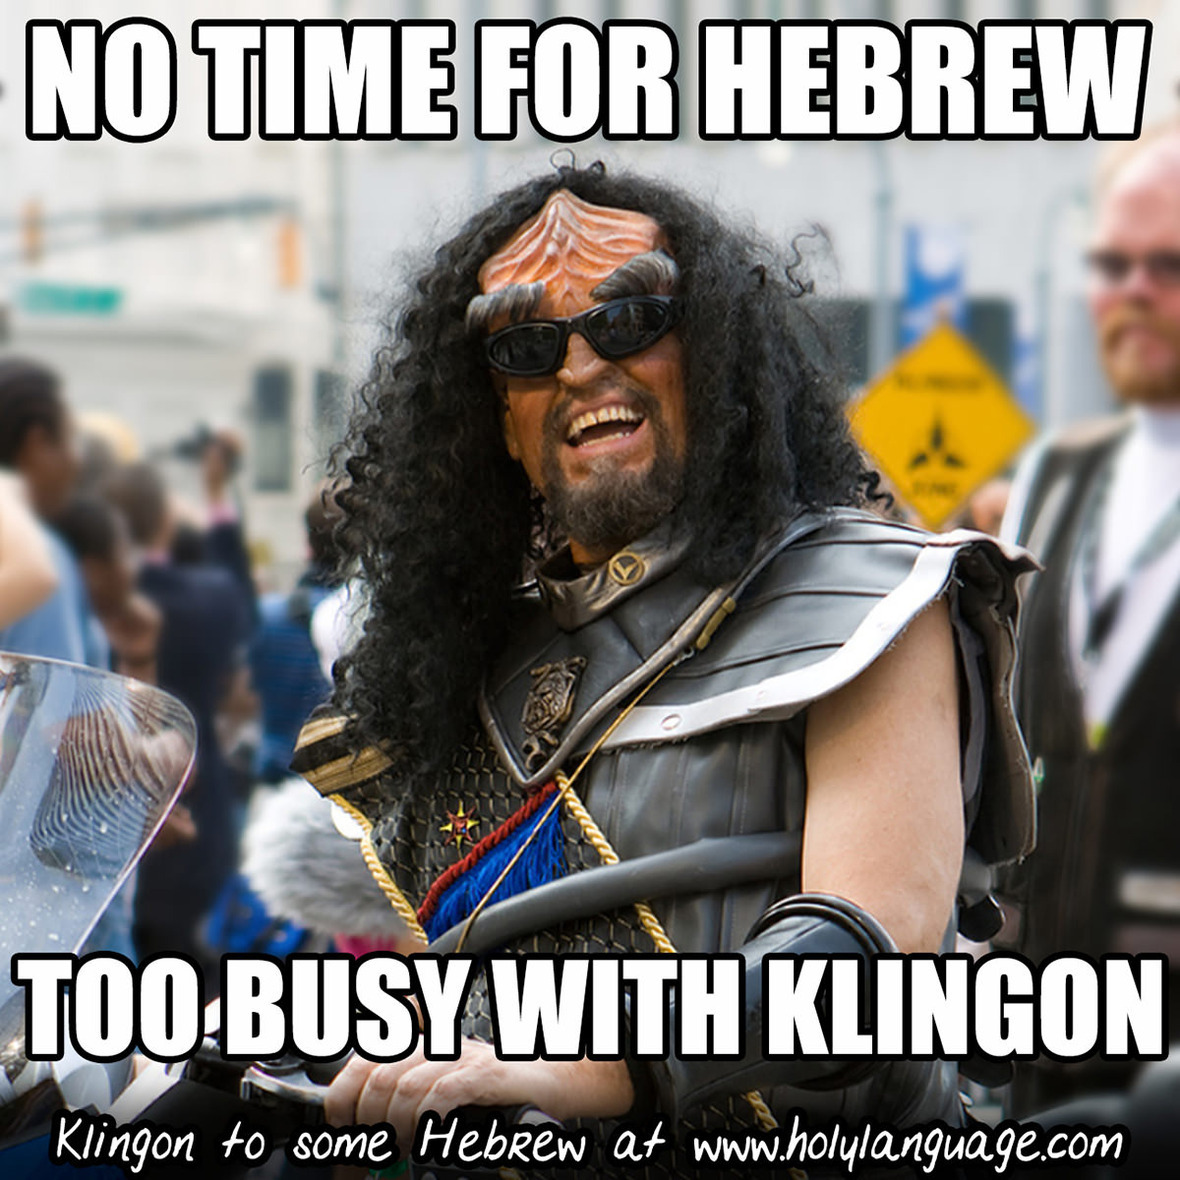 klingon HLI